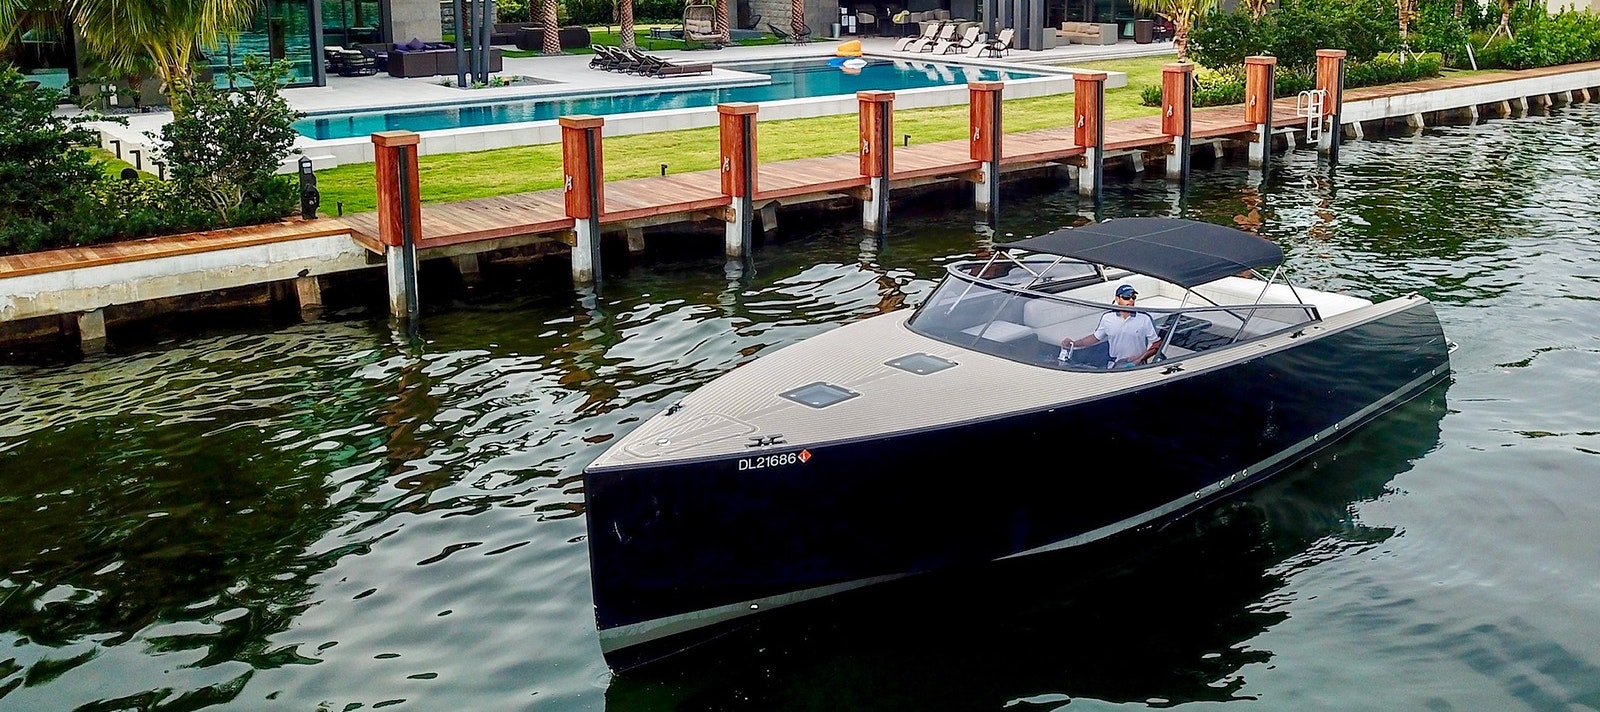 40 FT VanDutch yacht for rent in Miami